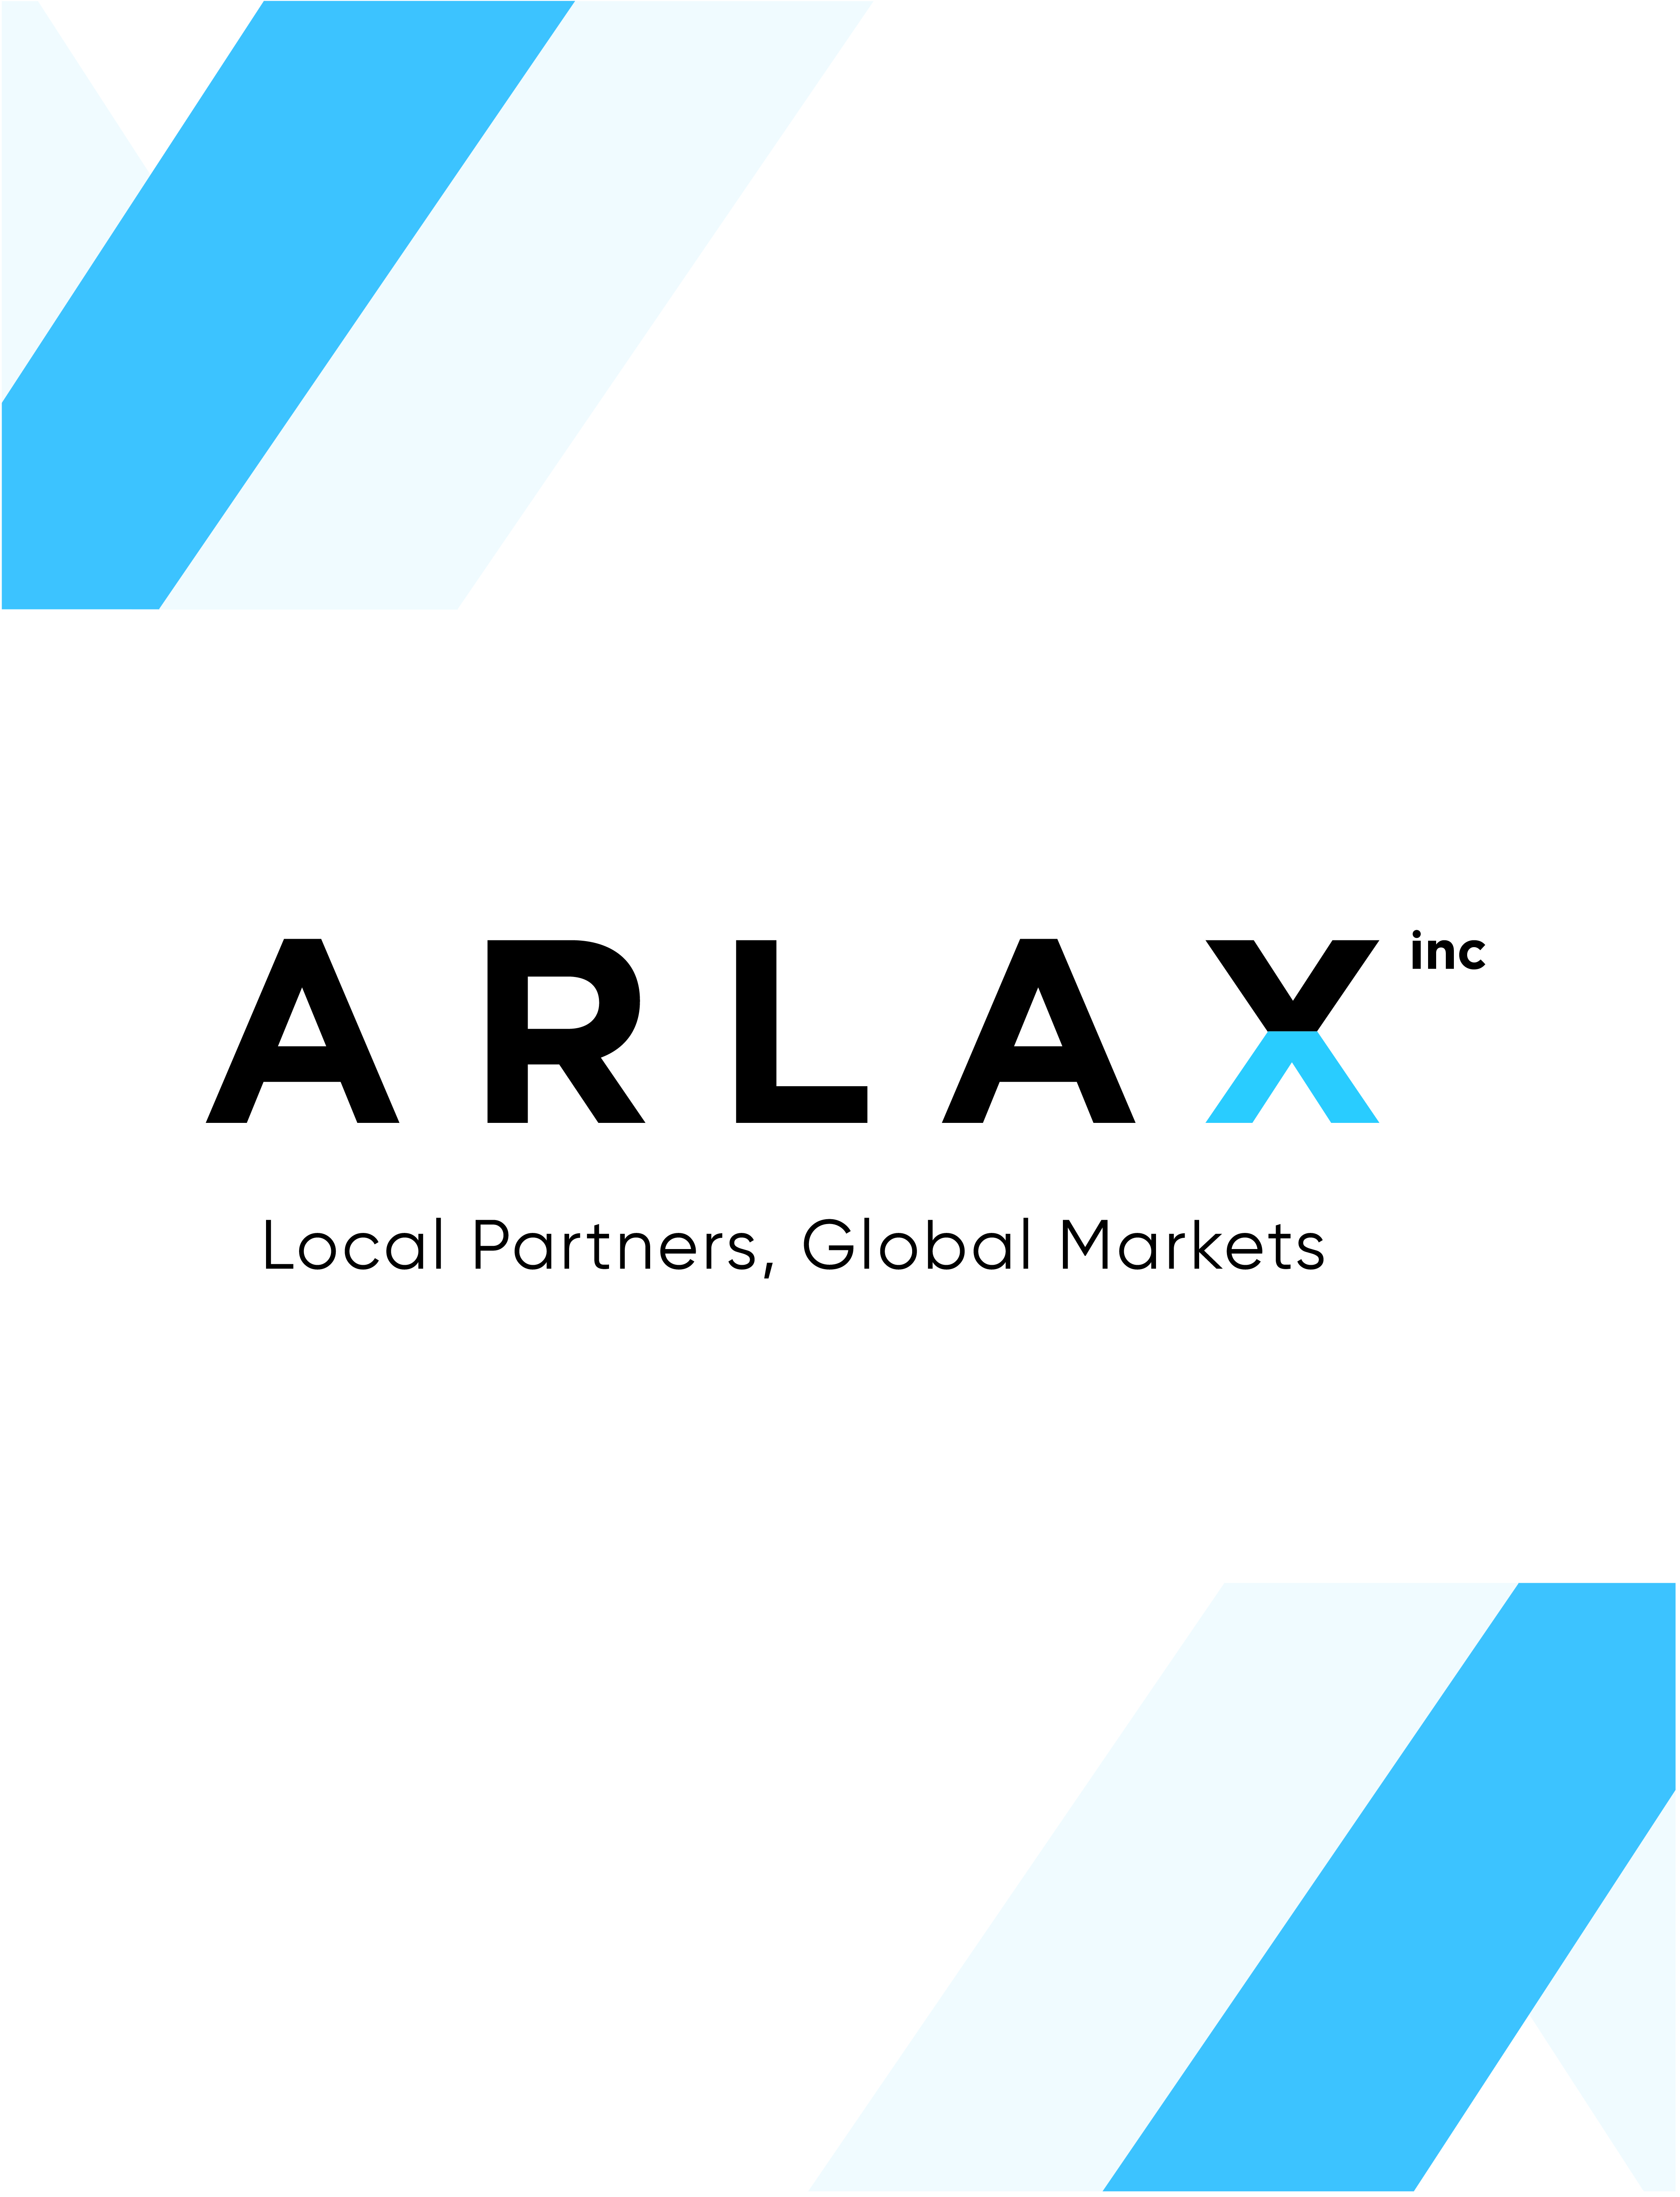 Arlax Logo and Branding Design